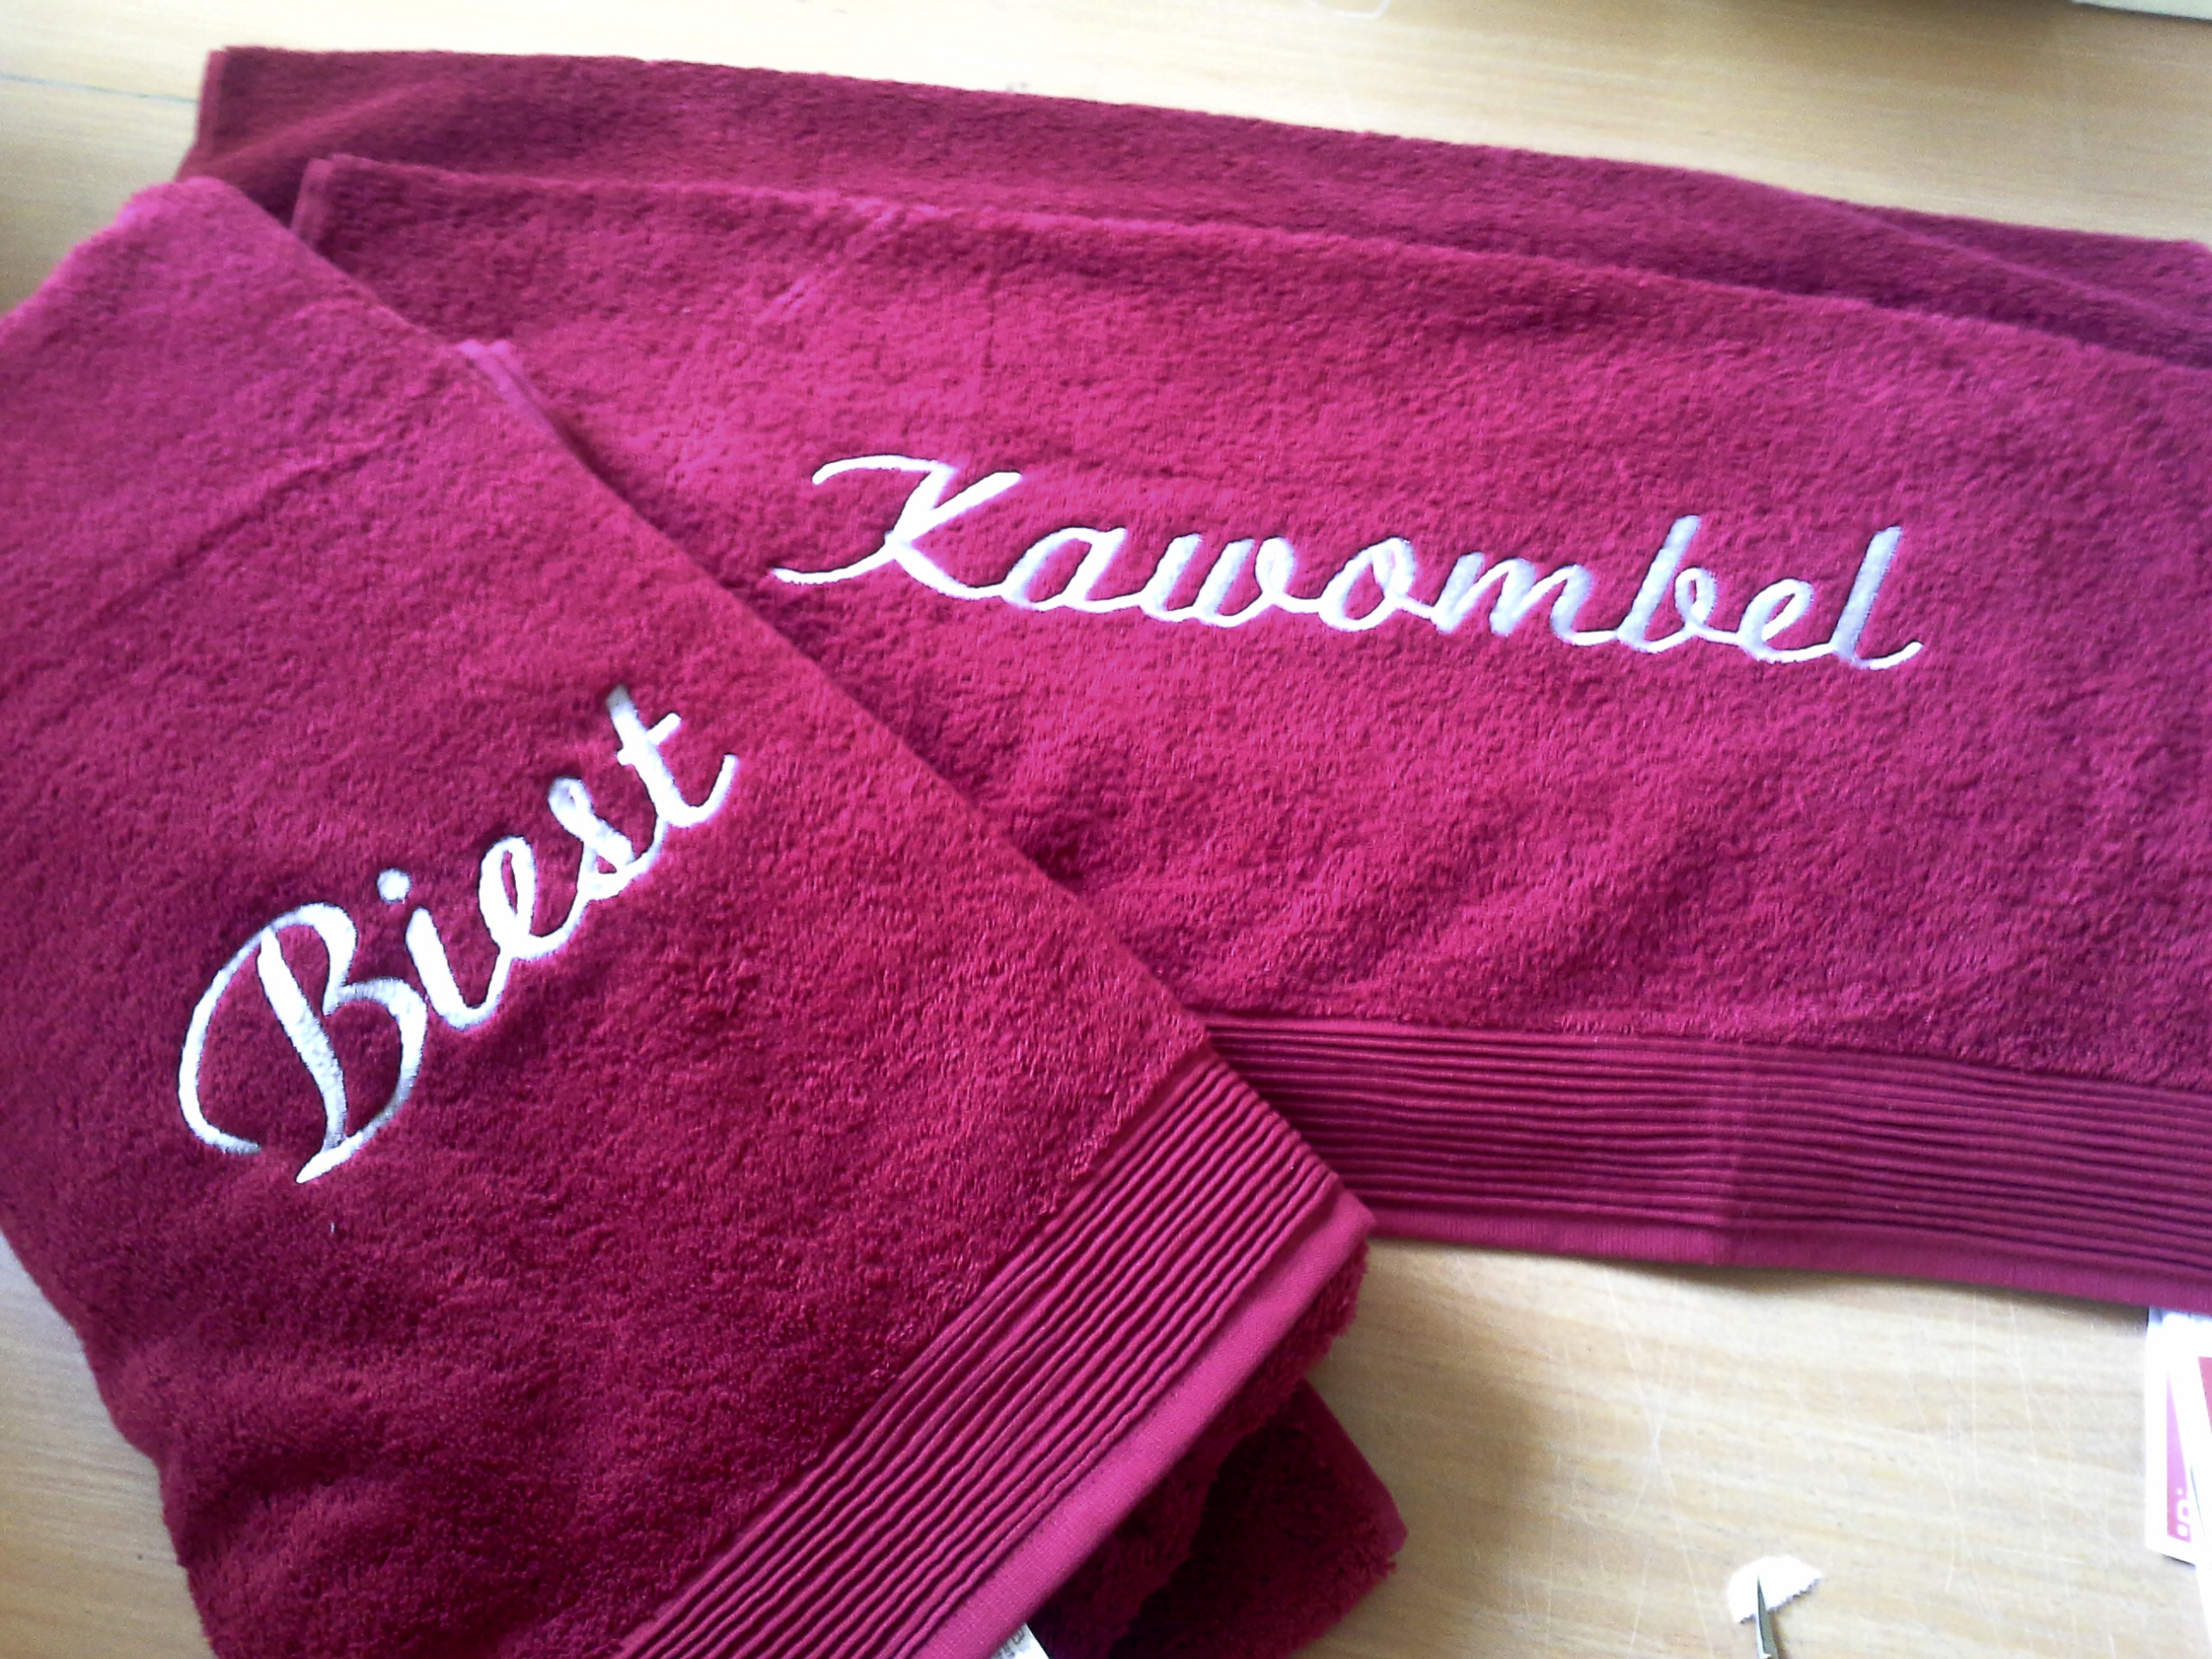 Biest & Kawombel